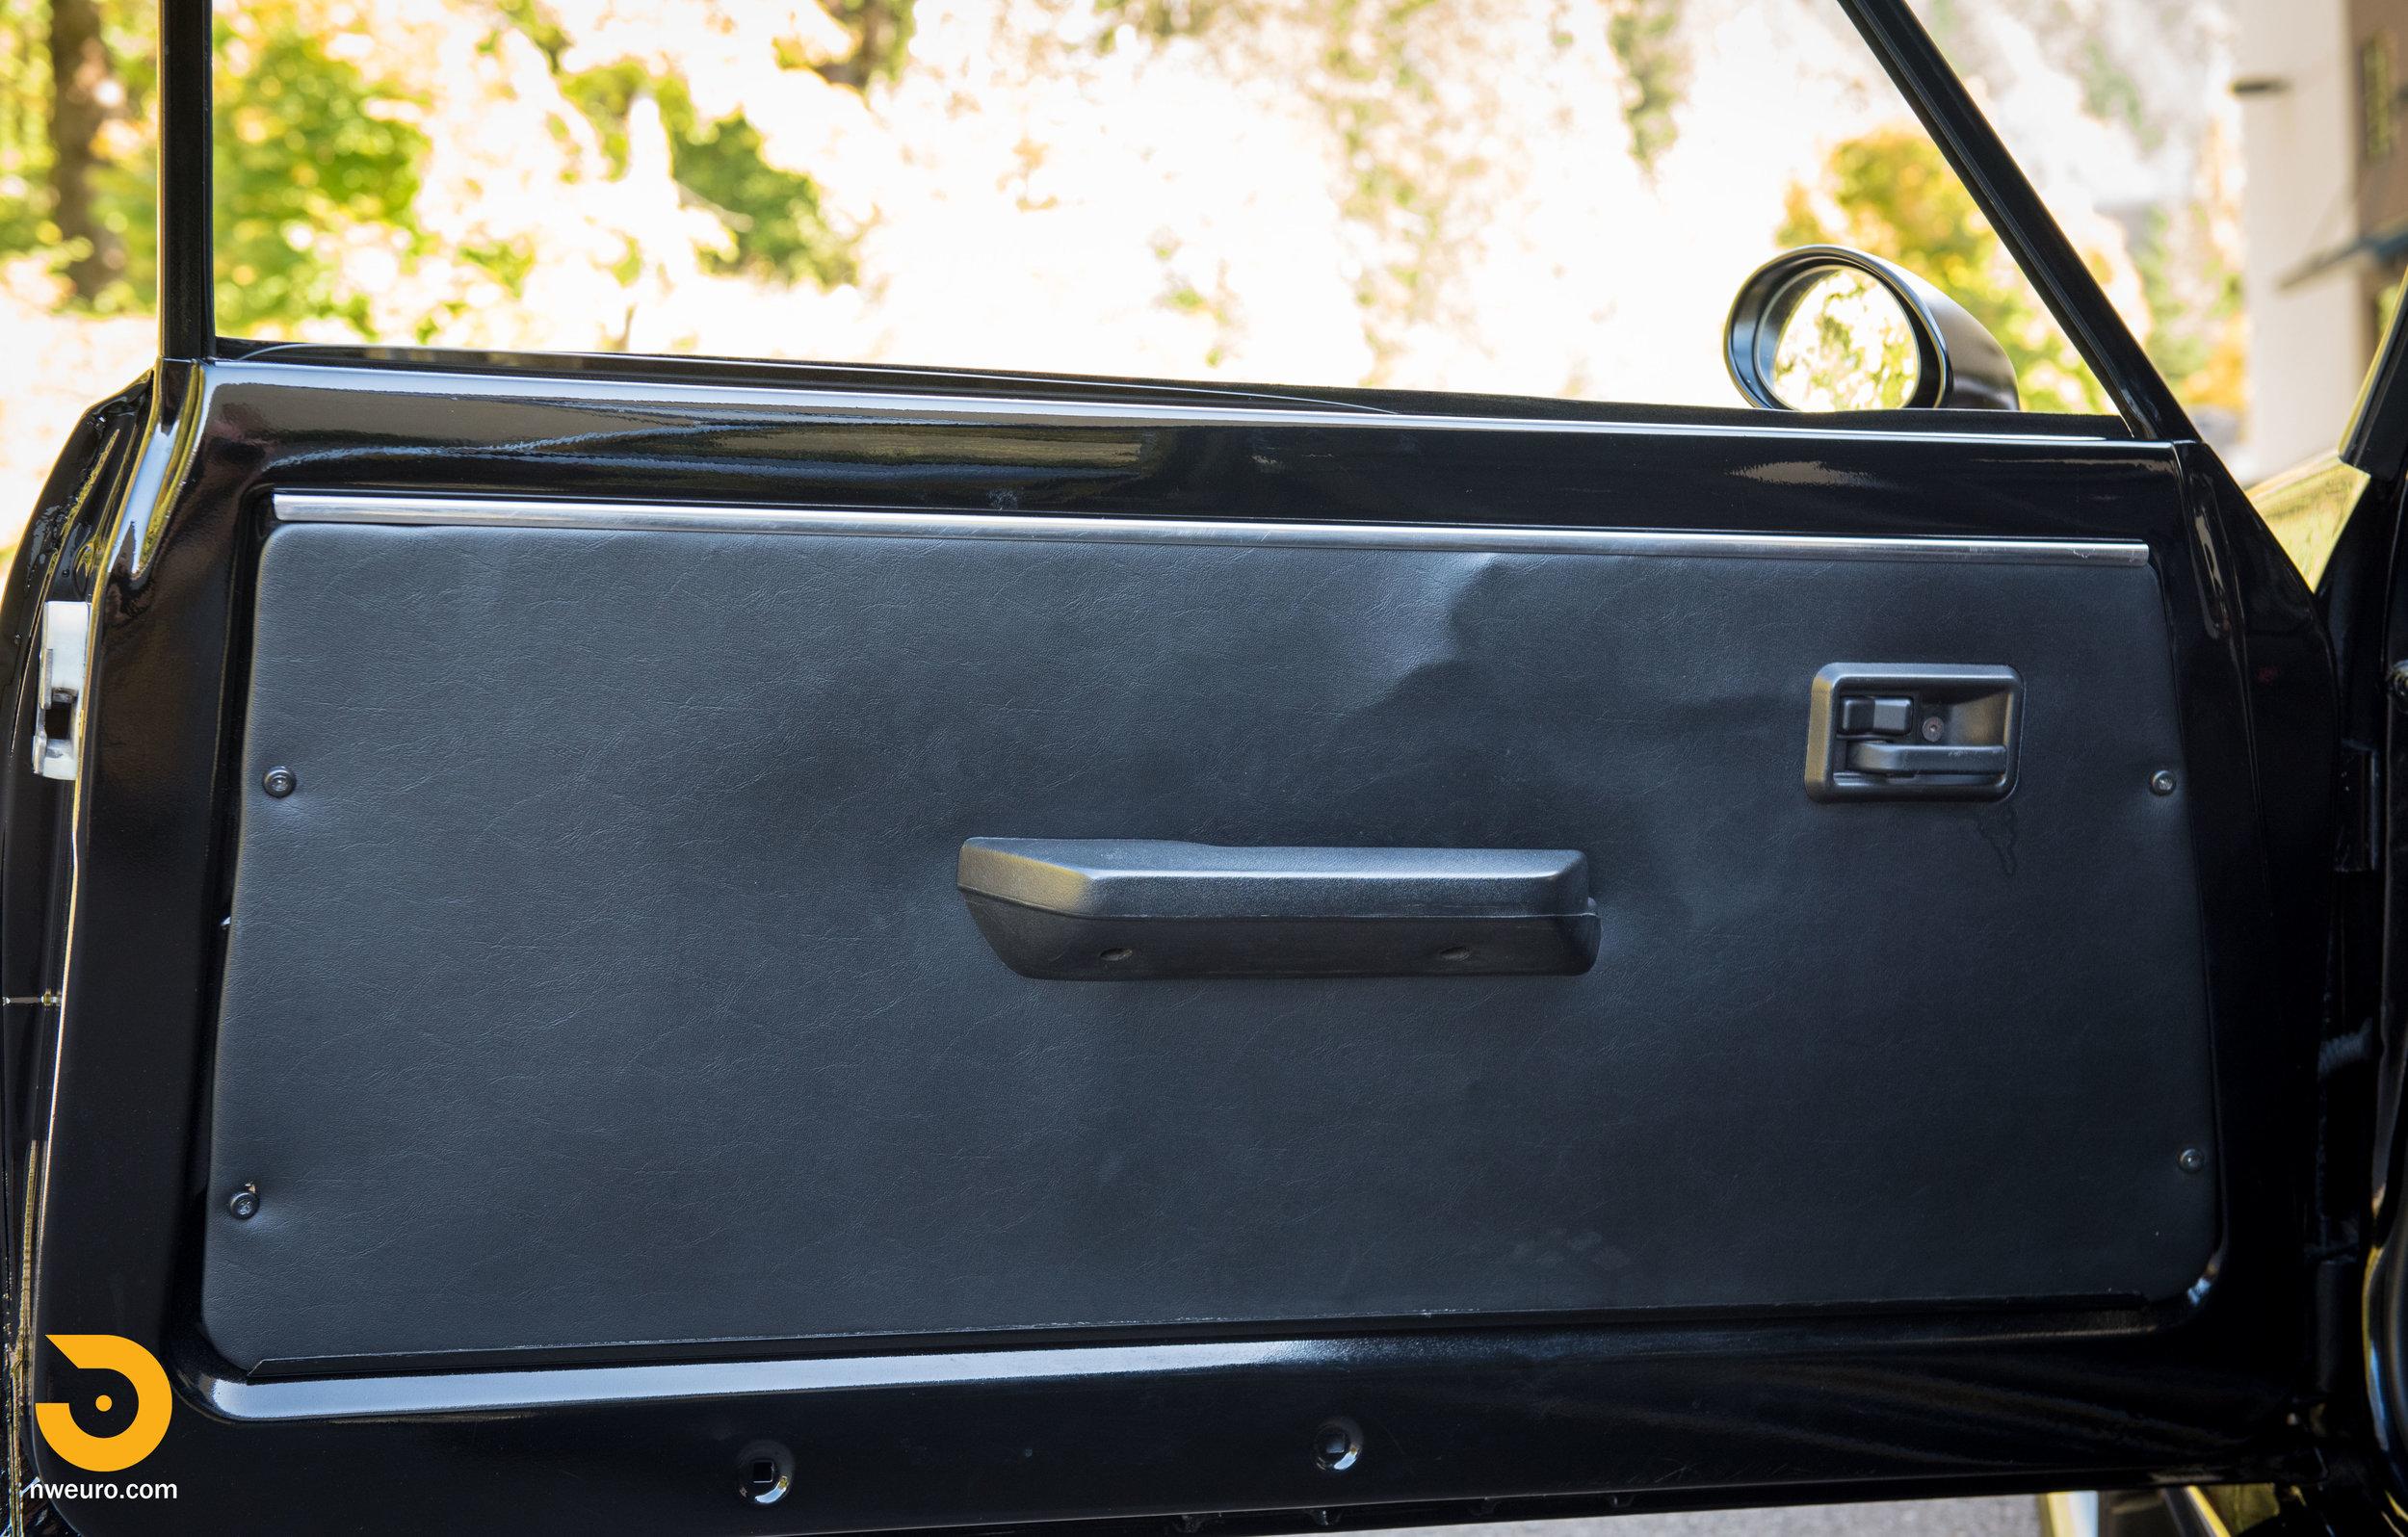 1983 Renault R5 Turbo 2 Black-5.jpg